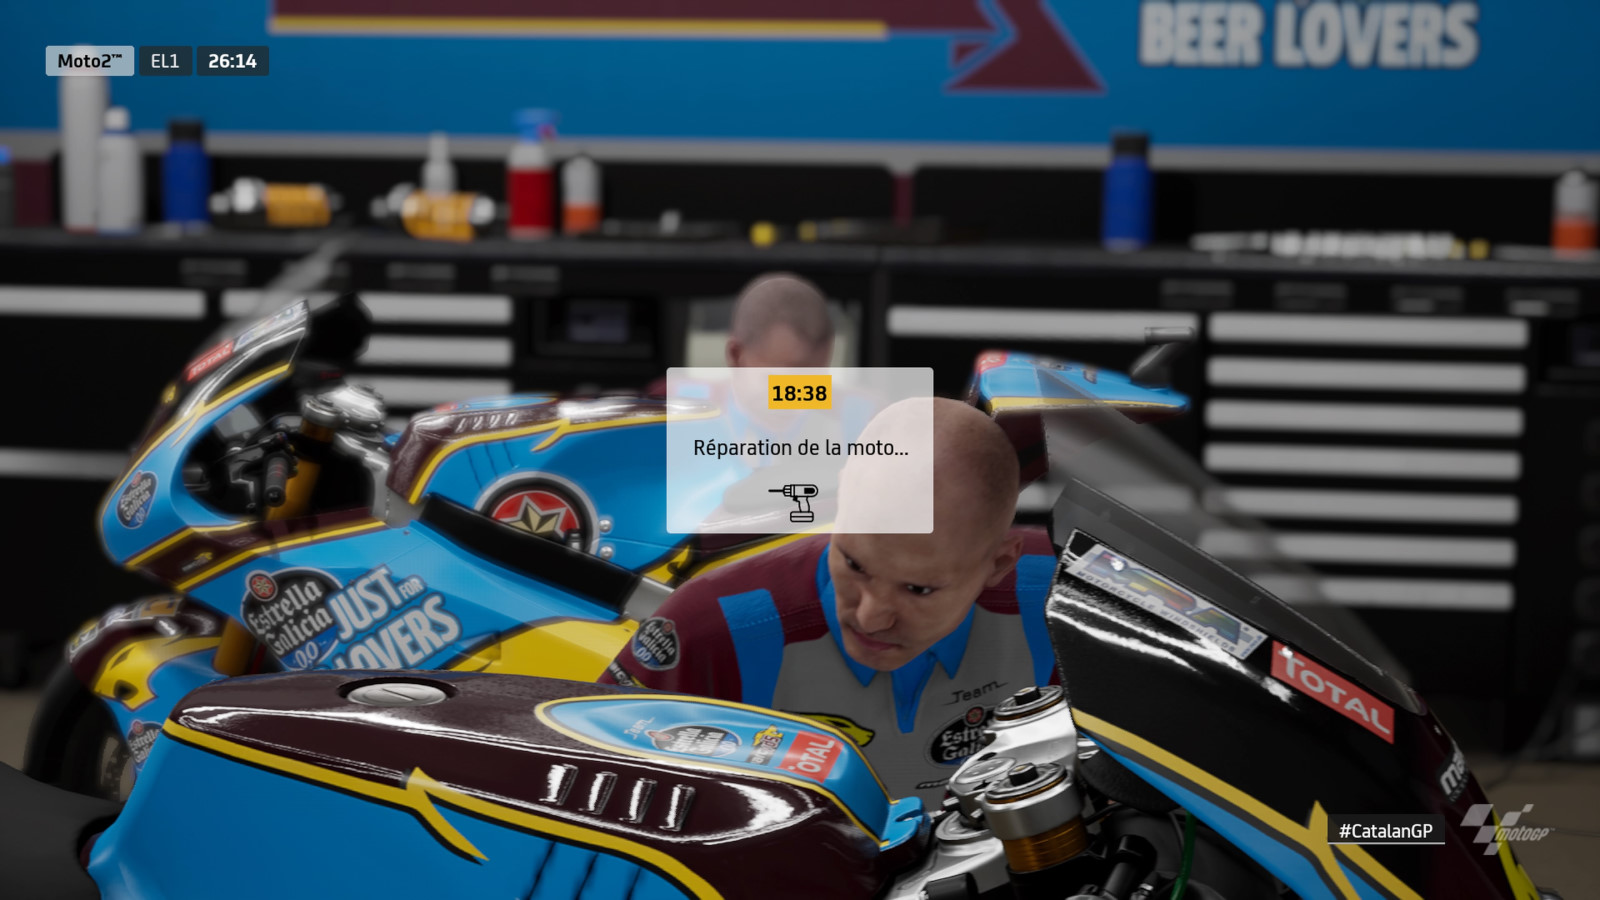 MotoGP20 PS4 Div 028